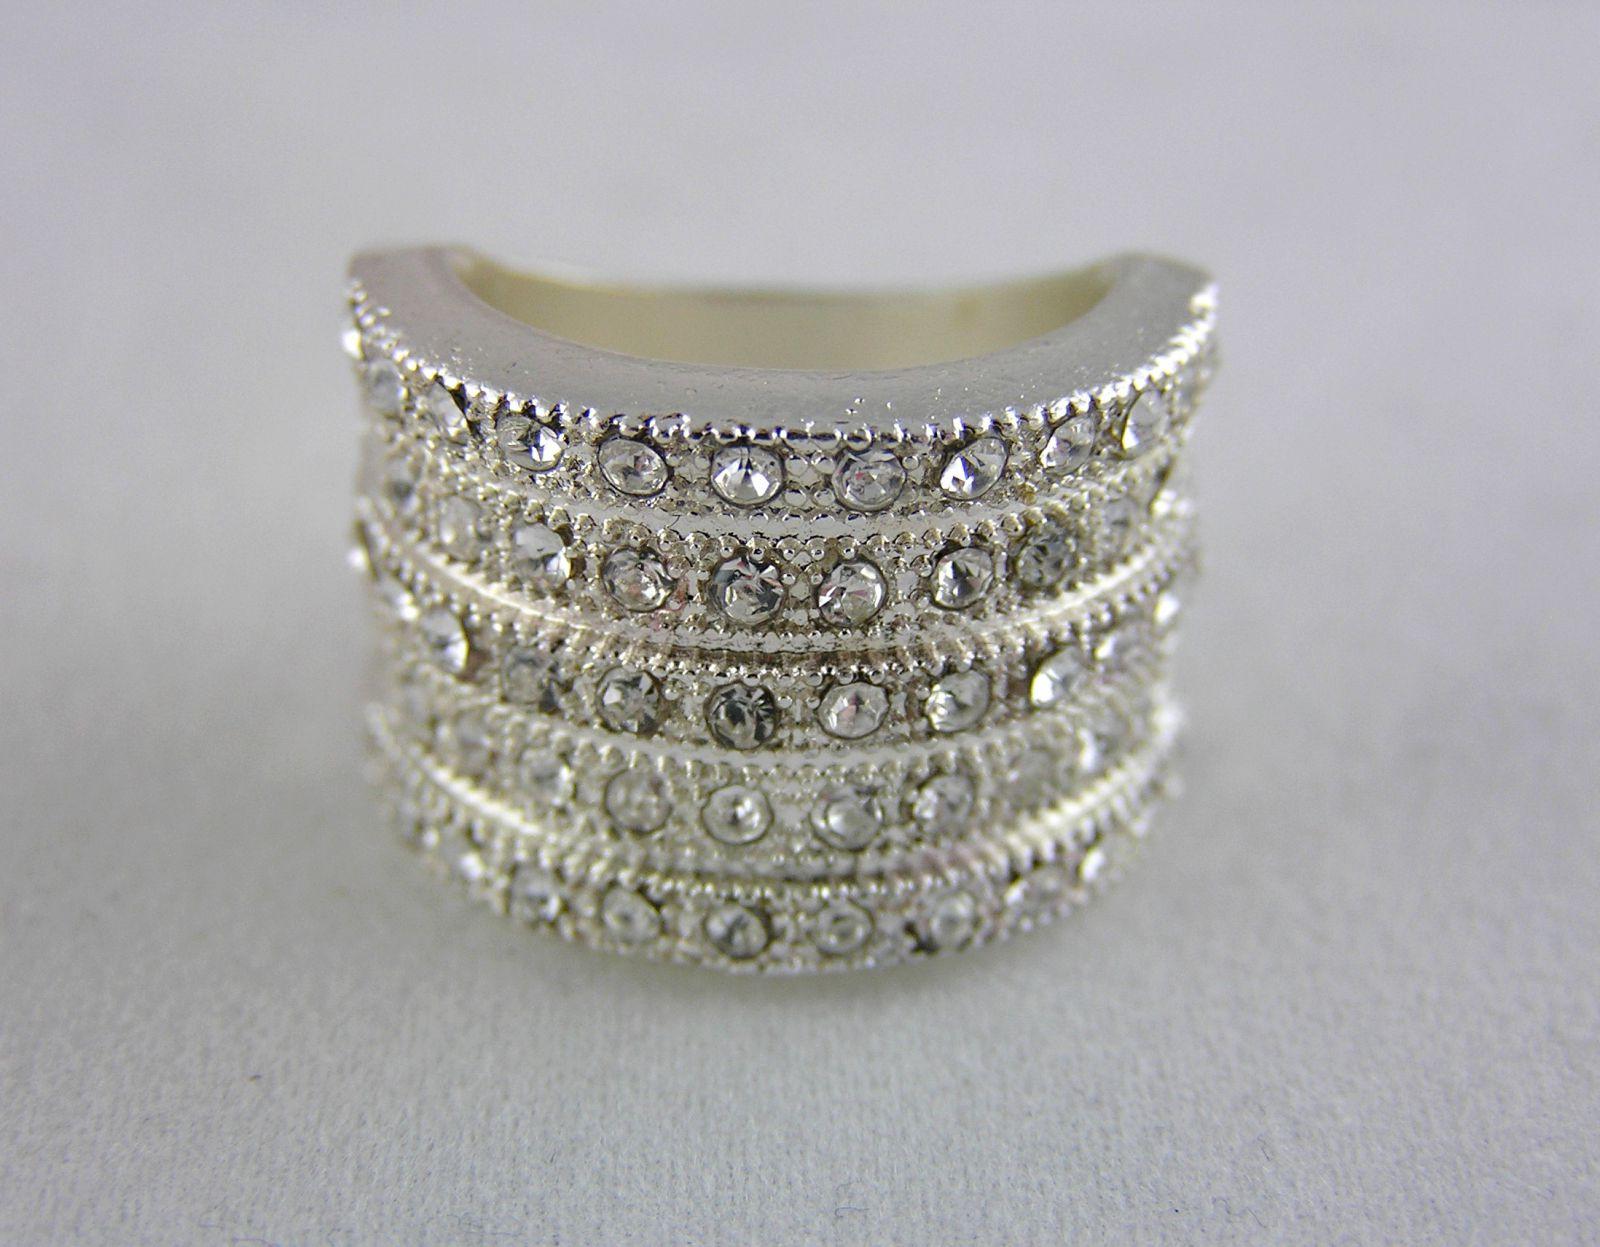 Kamínkový prstýnek stříbrné barvy GIIL